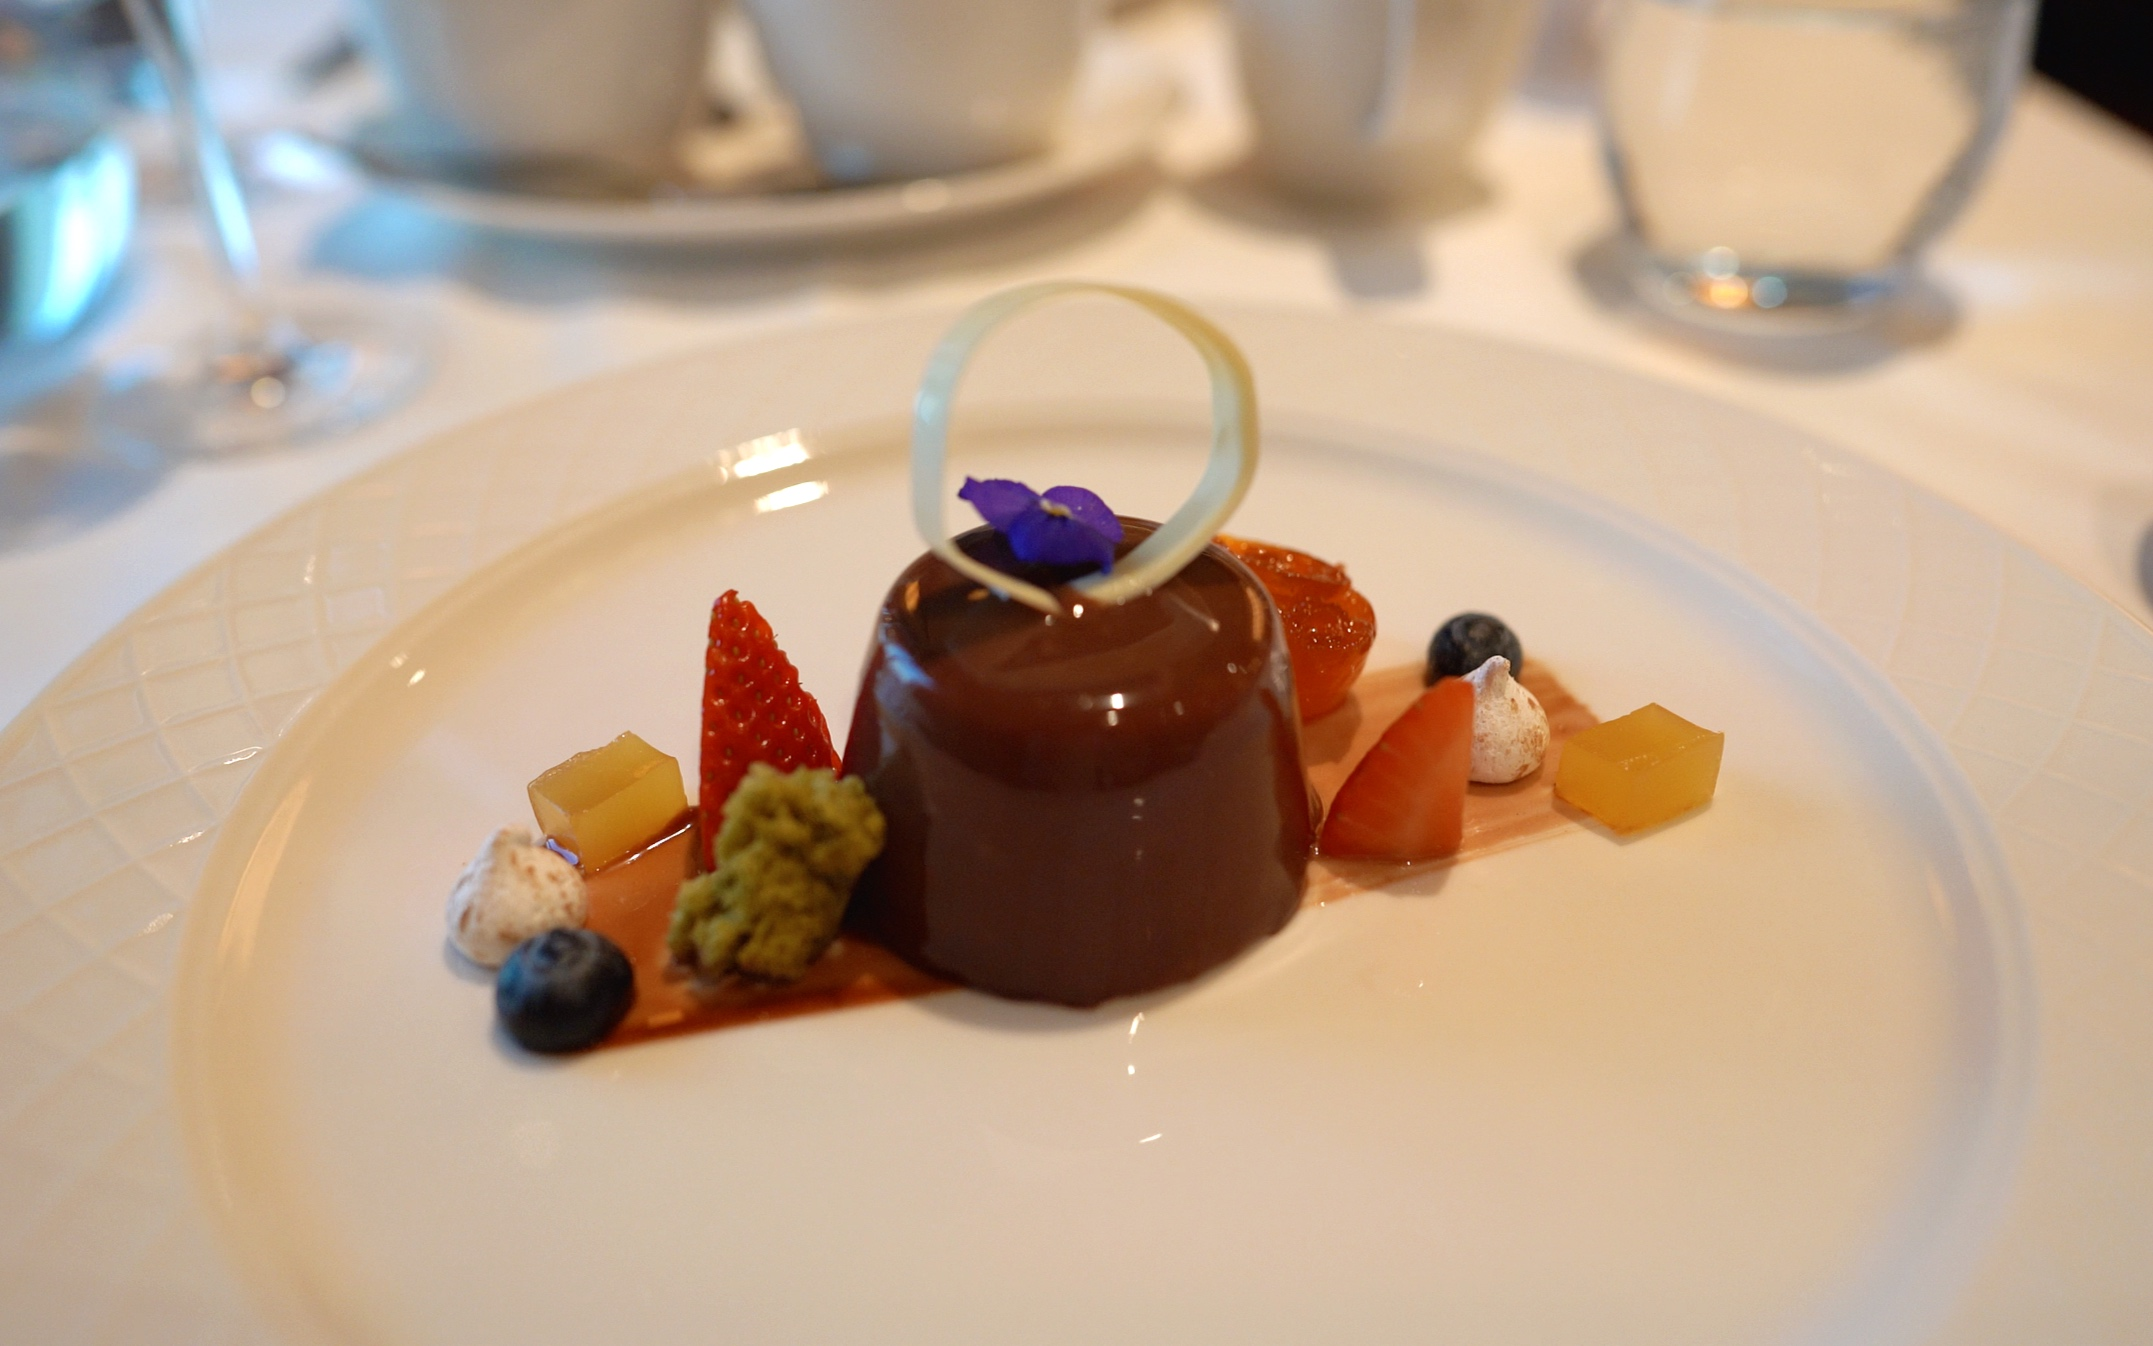 The chocolate hazelnut dessert.